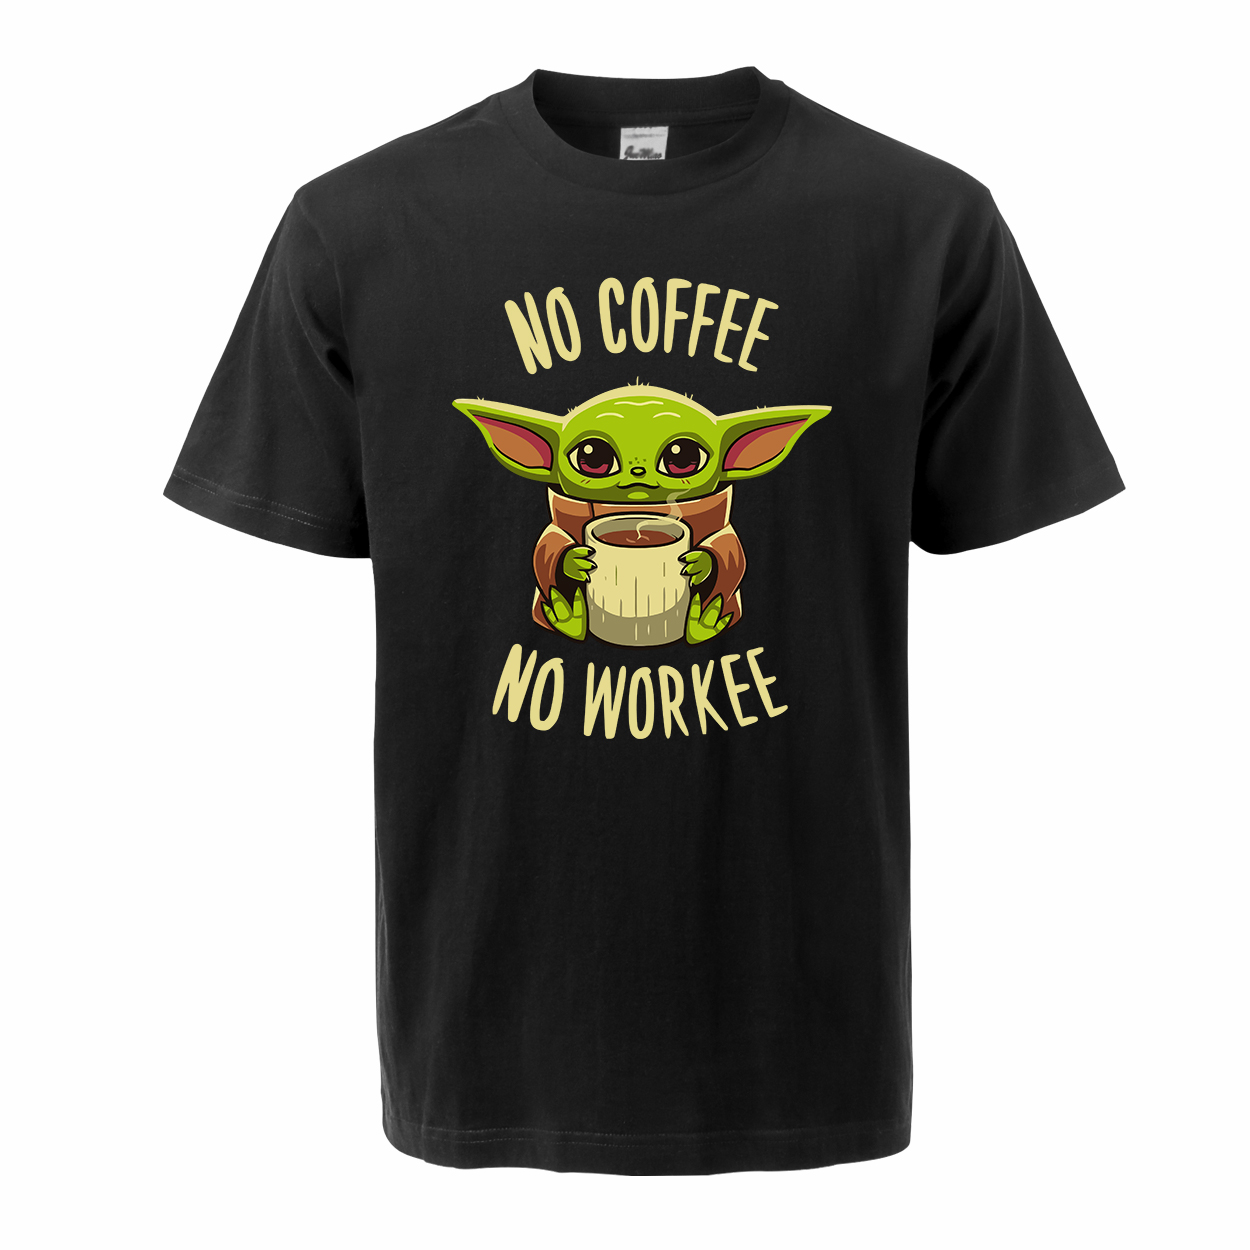 The Mandalorian Baby Yoda T Shirt For Men 2020 Summer Cotton Cute Young Yoda No Coffee No Workee Short Sleeve Tee Cool Male Tops